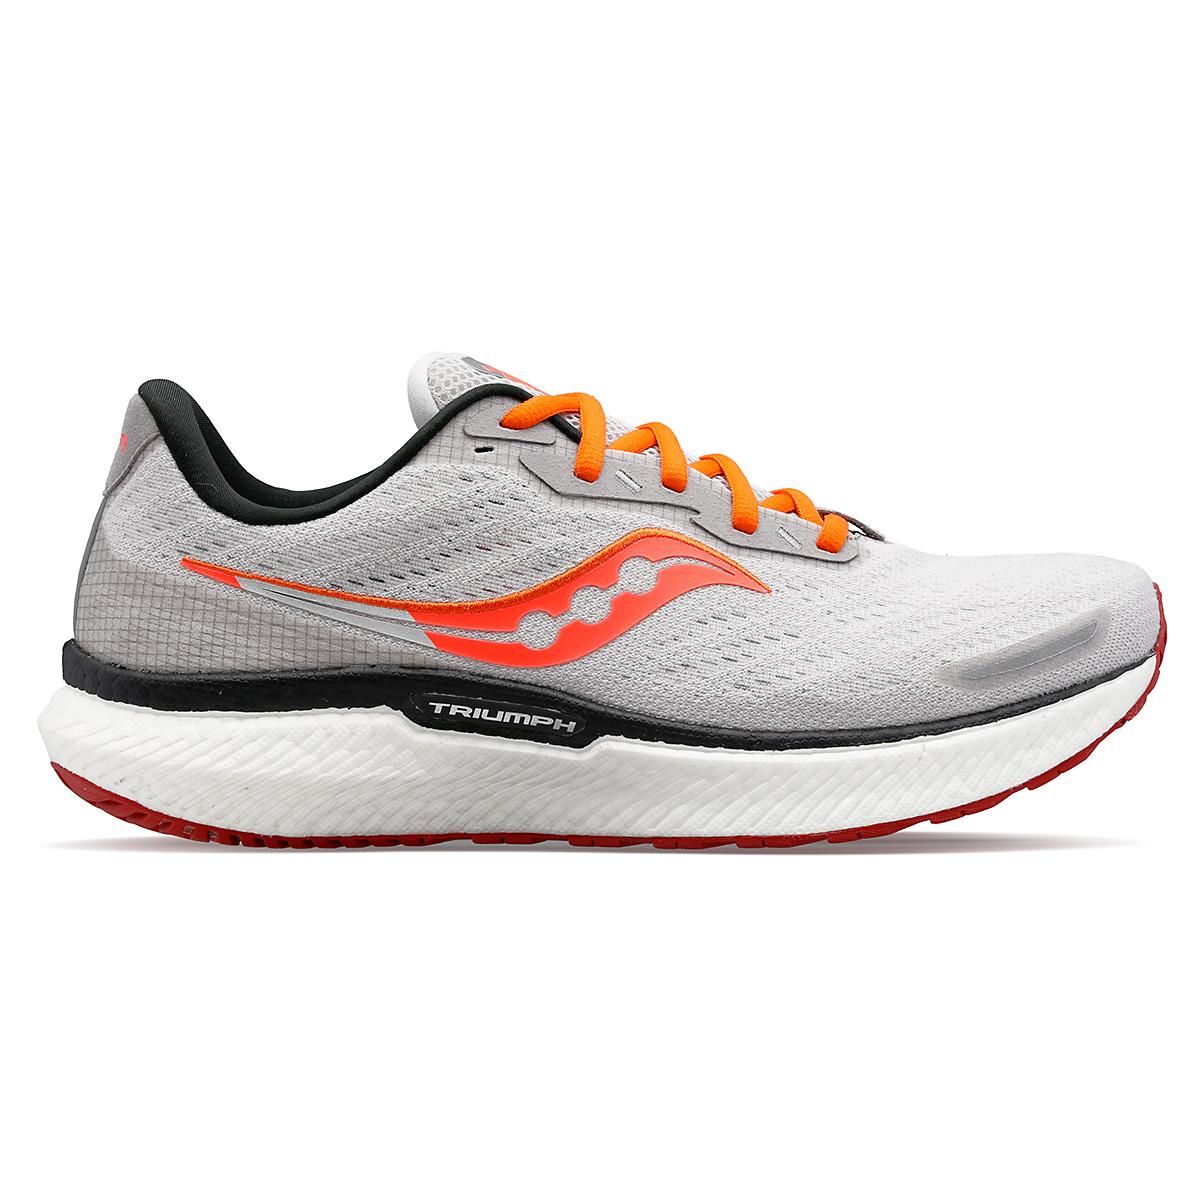 Men's Saucony Triumph 19 Running Shoe - Color: Jackalope - Size: 7 - Width: Regular, Jackalope, large, image 1